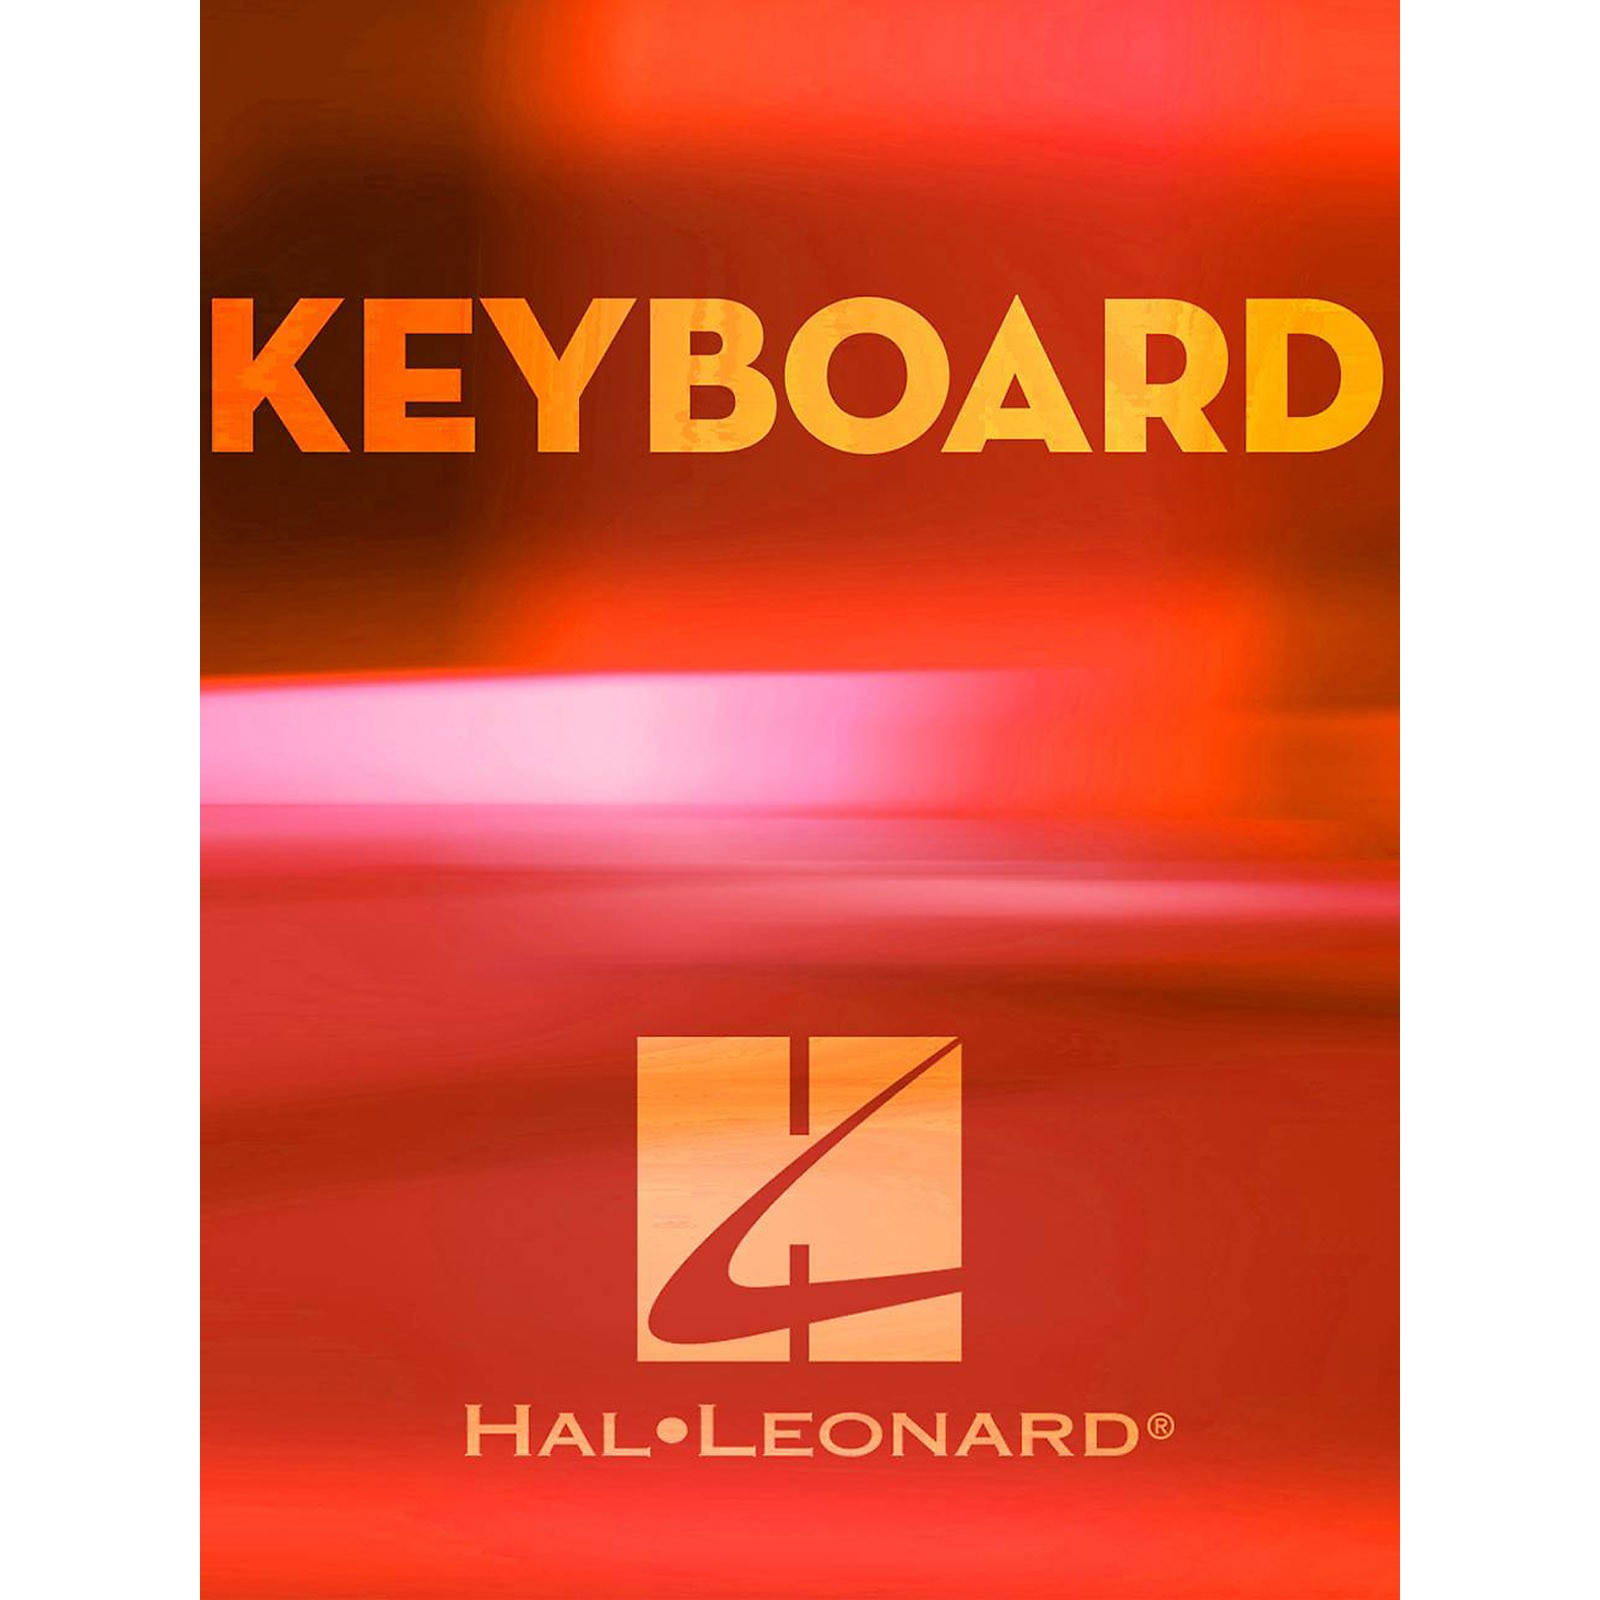 Hal Leonard O Holy Night - Piano Solo (Piano Solo) Piano Solo Sheets Series